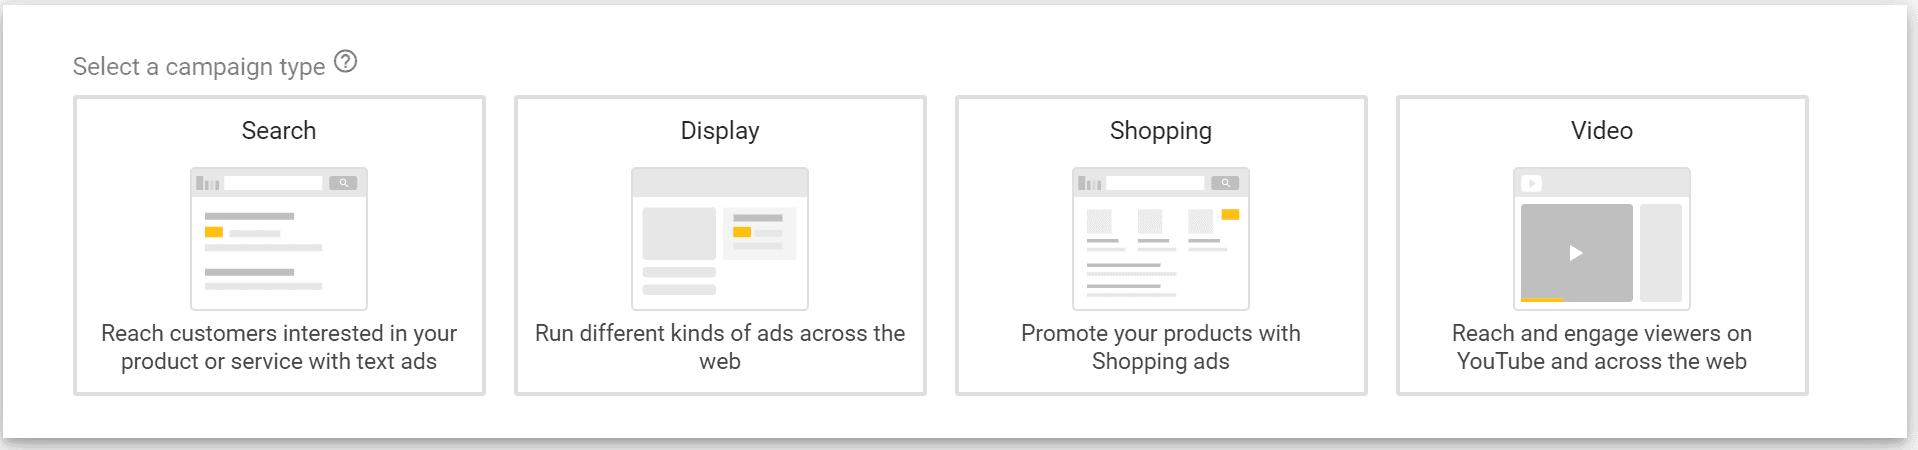 google ads campaign setup type